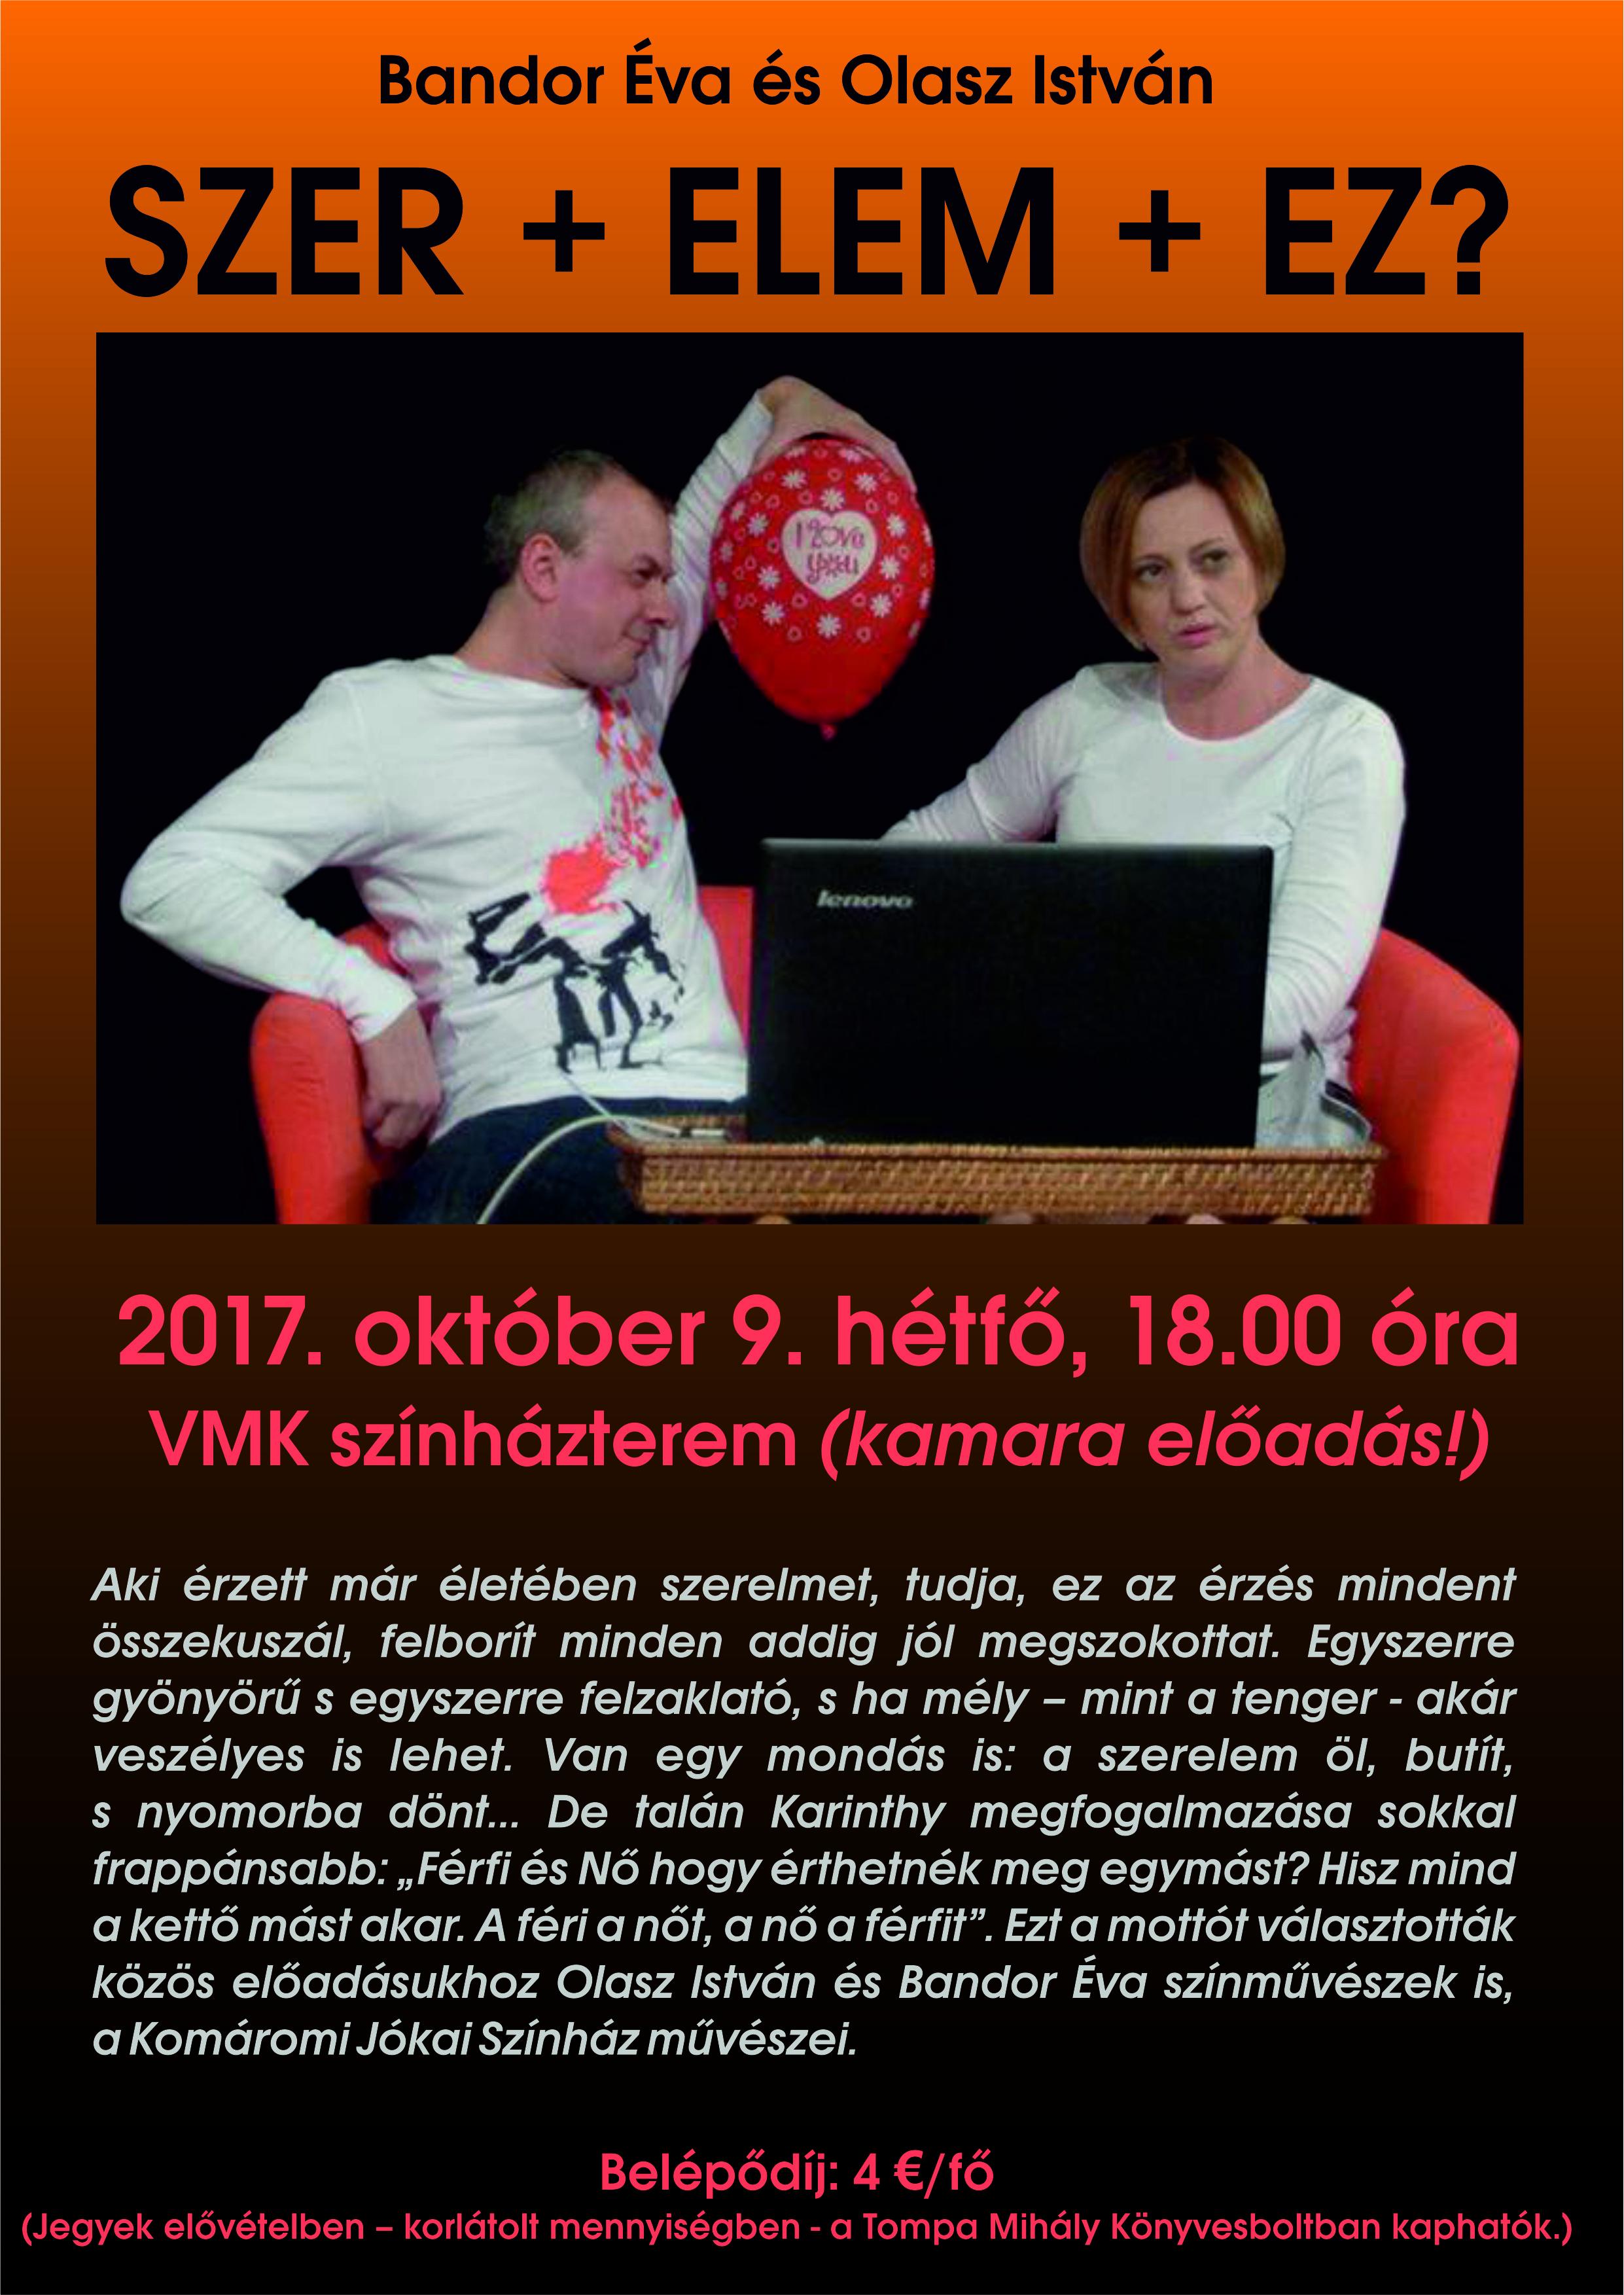 Szer+elem+ez? - divadlo poézie @ divadelná sála DK (javisko) | Banskobystrický kraj | Slovensko